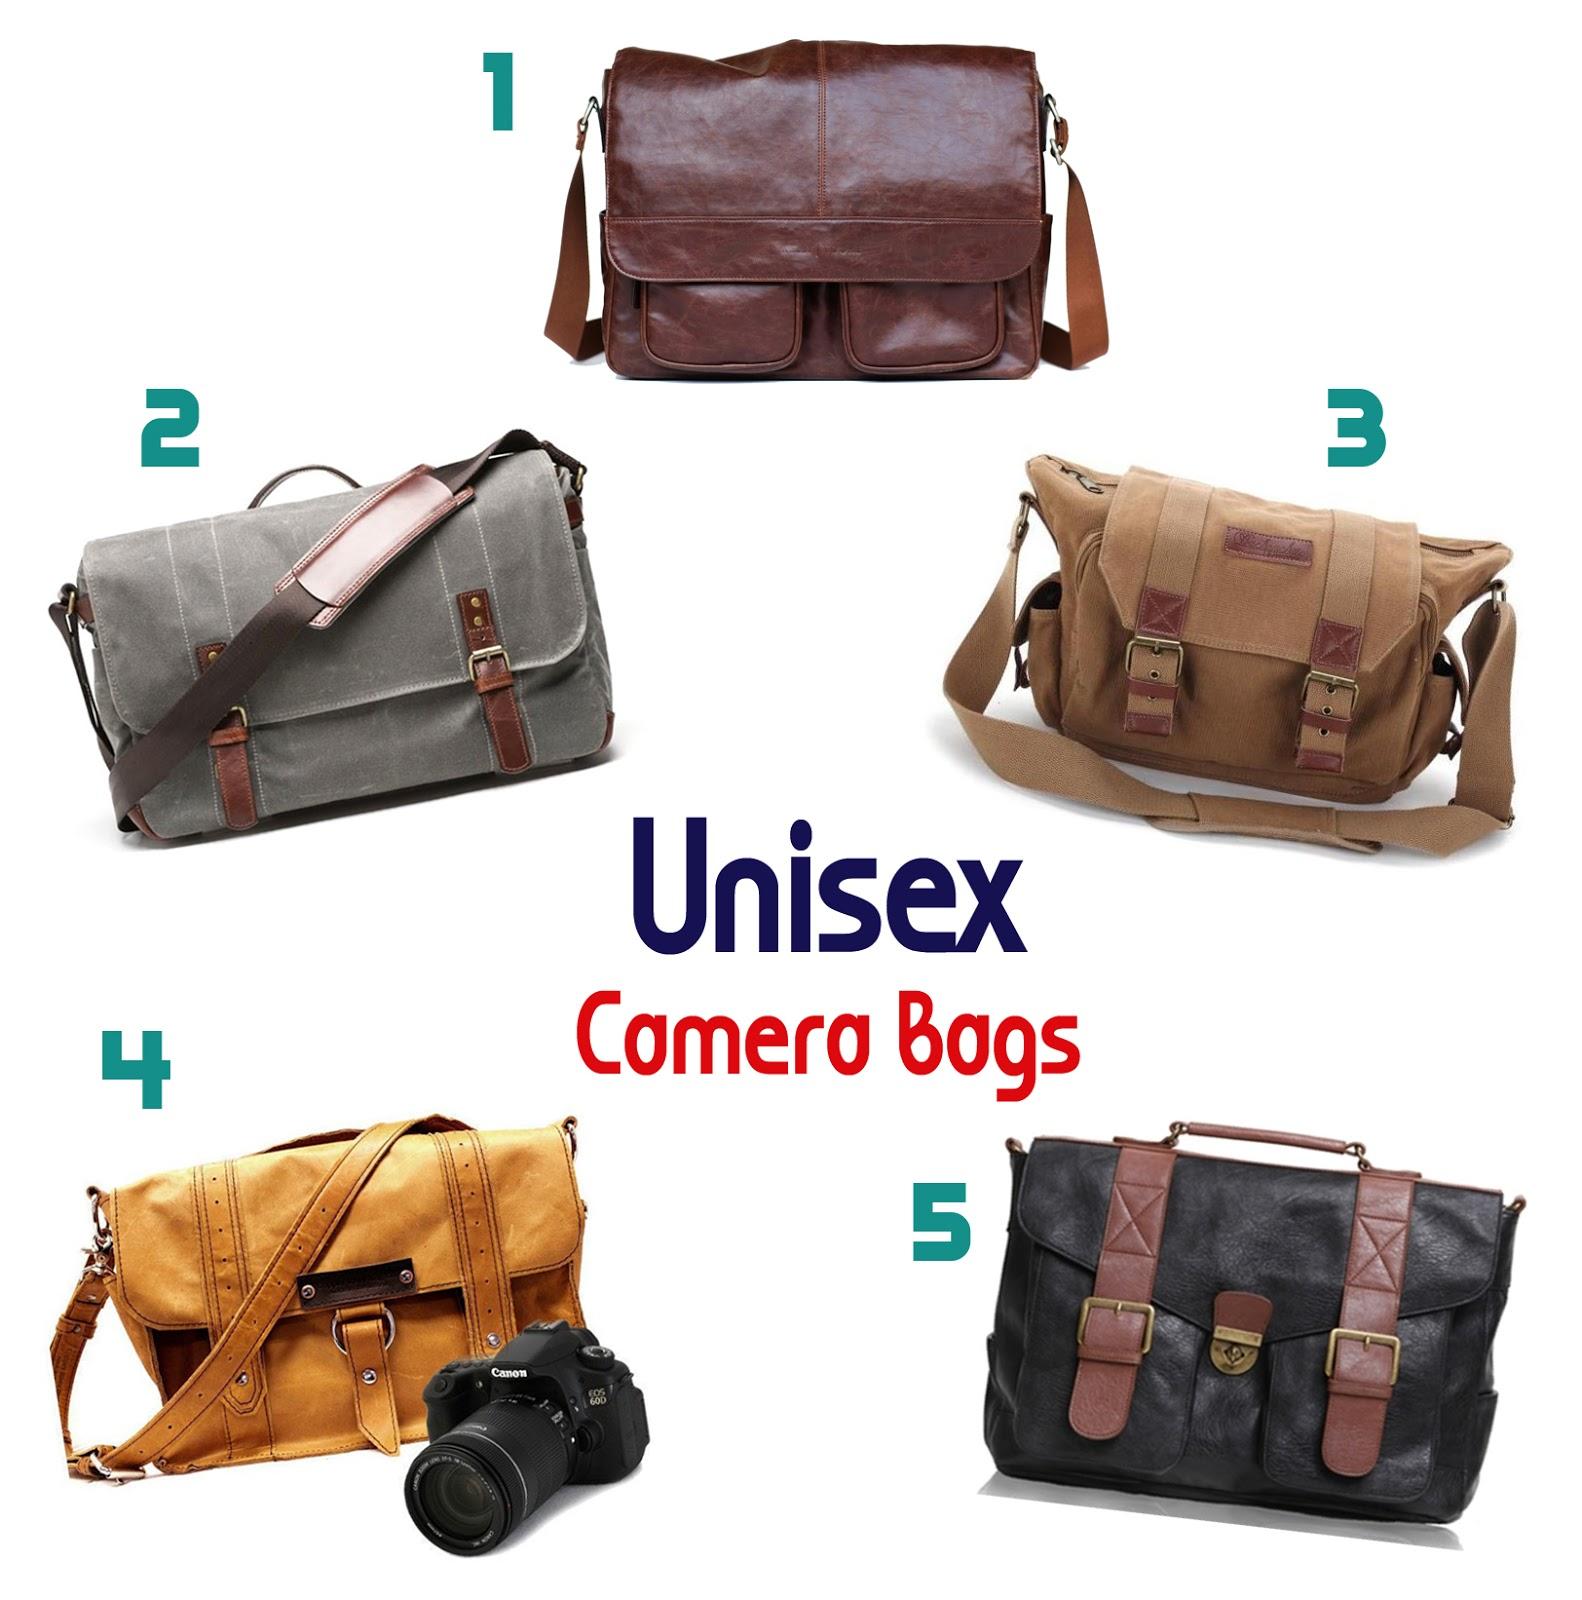 http://3.bp.blogspot.com/-7W6xtnWb0XQ/UQnxTvIpl9I/AAAAAAAAERU/5cW9LxSHgSg/s1600/Fashionable%20camera%20bags%20-%20Unisex.jpg